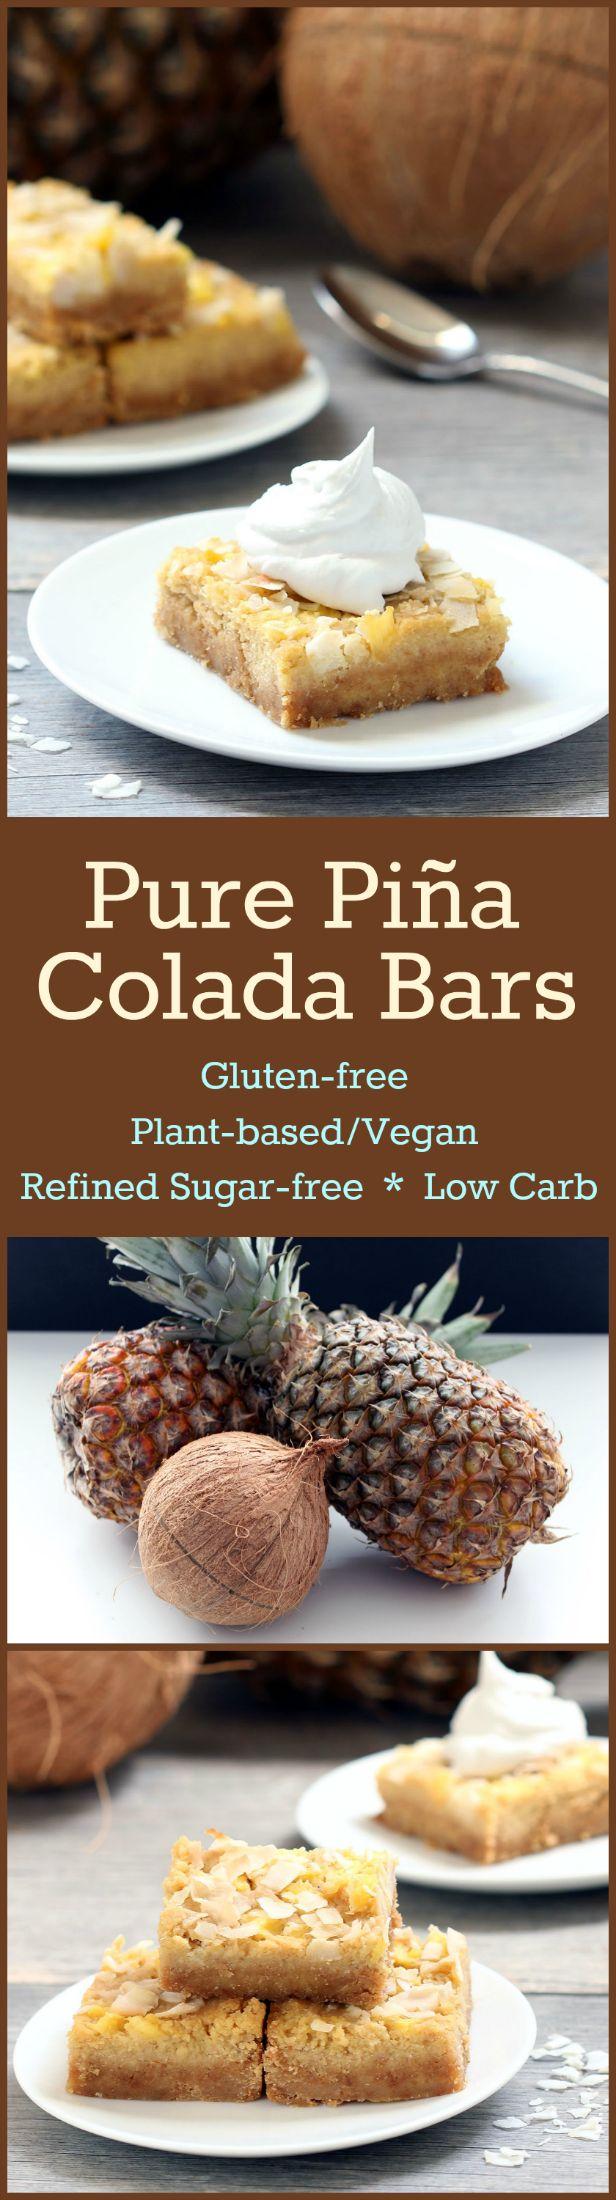 Pure Pina Colada Bar Collage